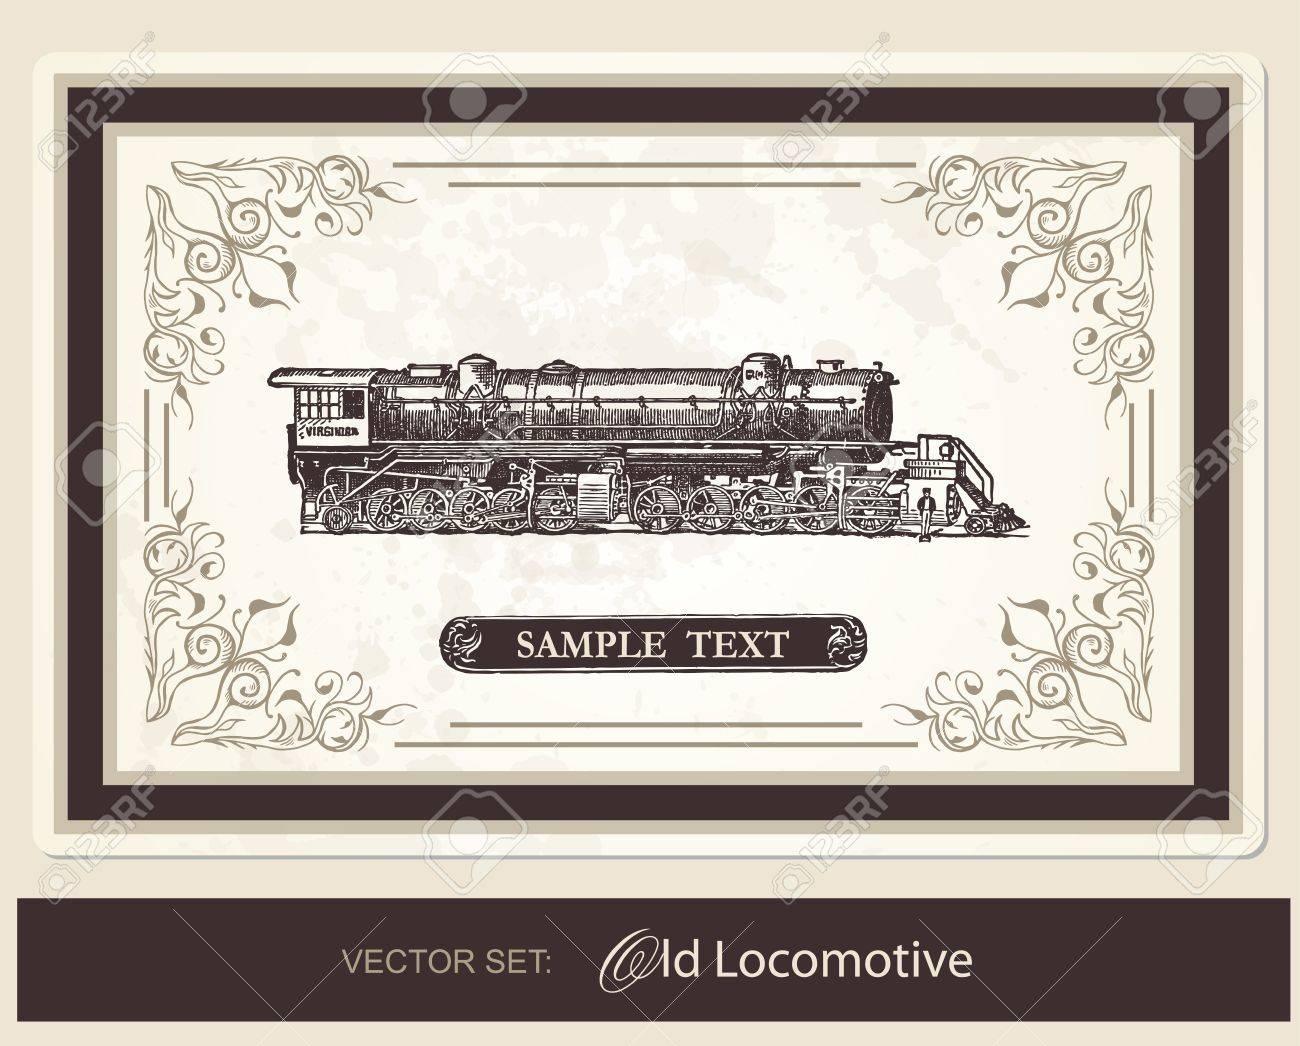 Historical Locomotive Stock Vector - 10421571